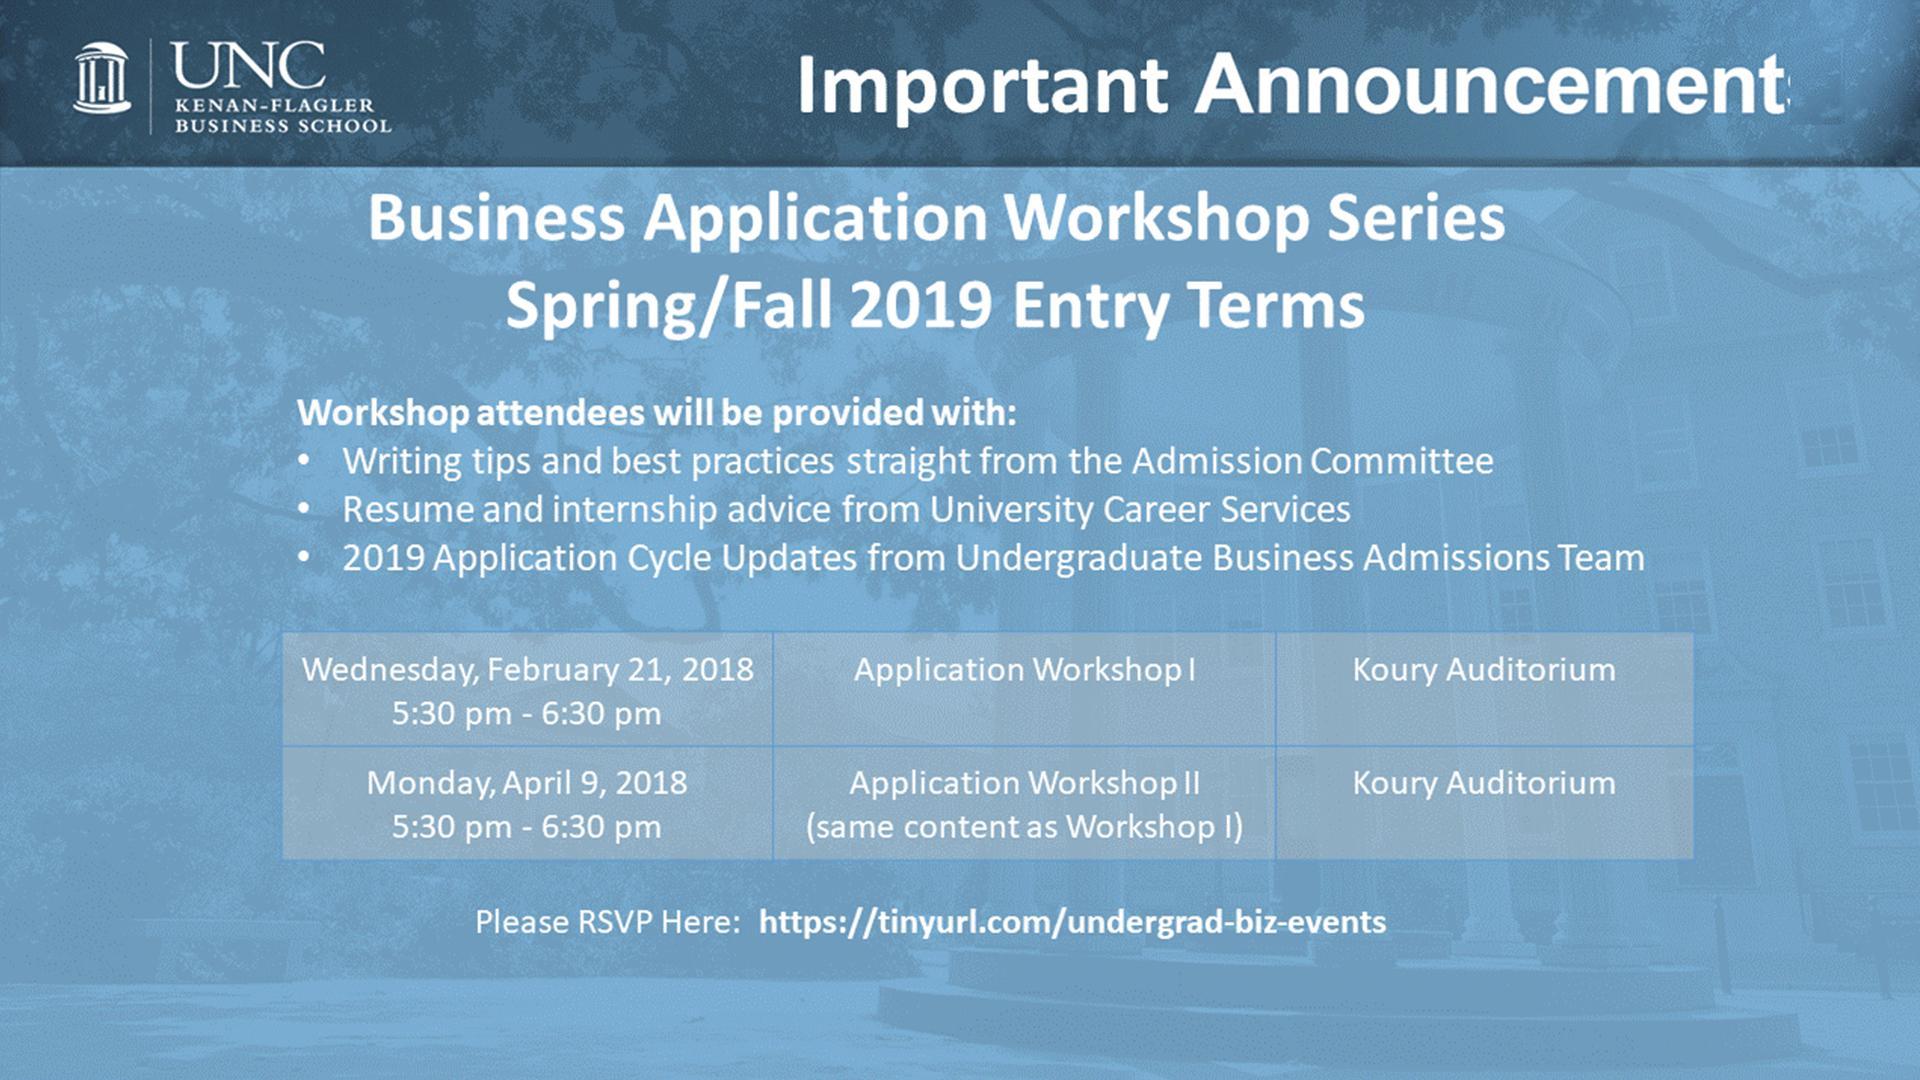 Business Application Workshop Series